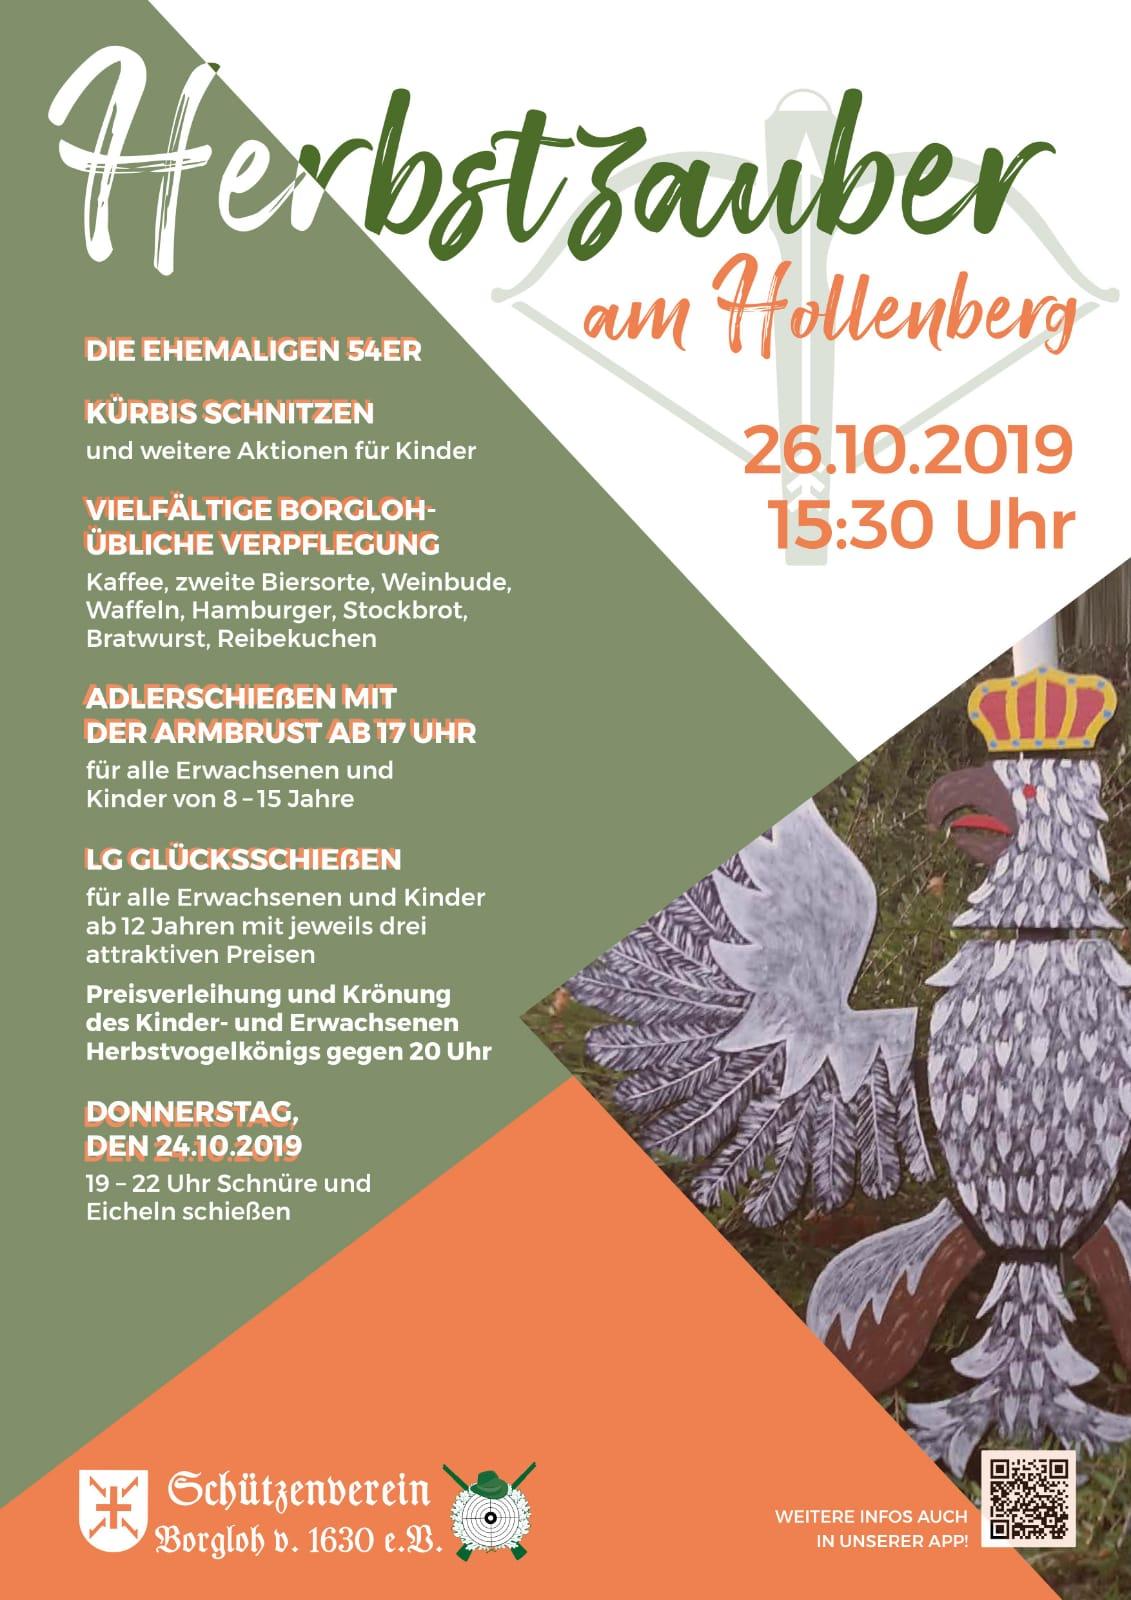 Herbstzauber am Hollenberg